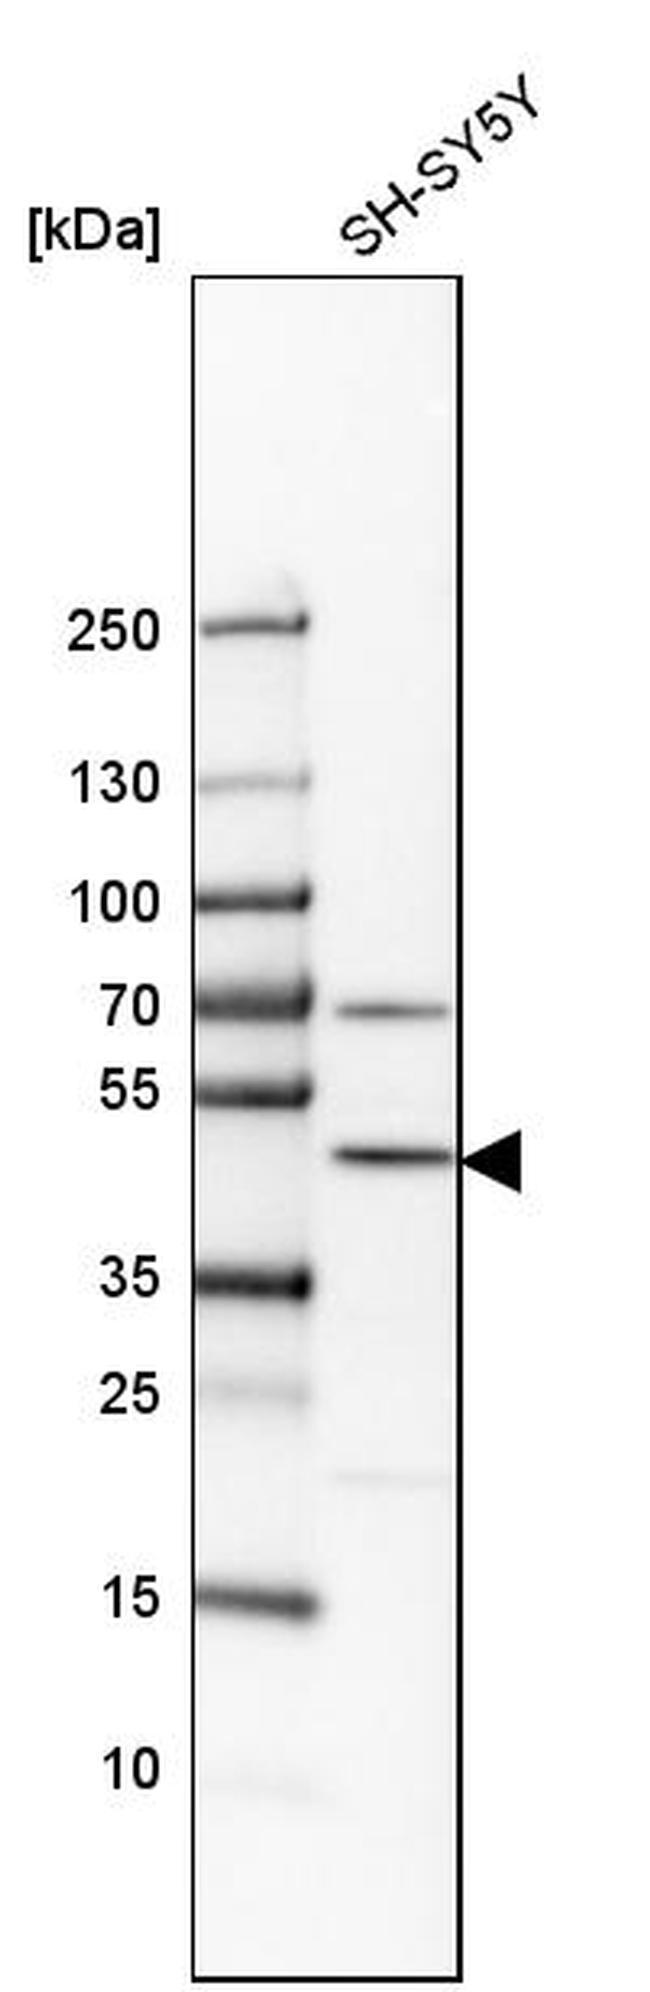 G3BP2 Antibody in Western Blot (WB)